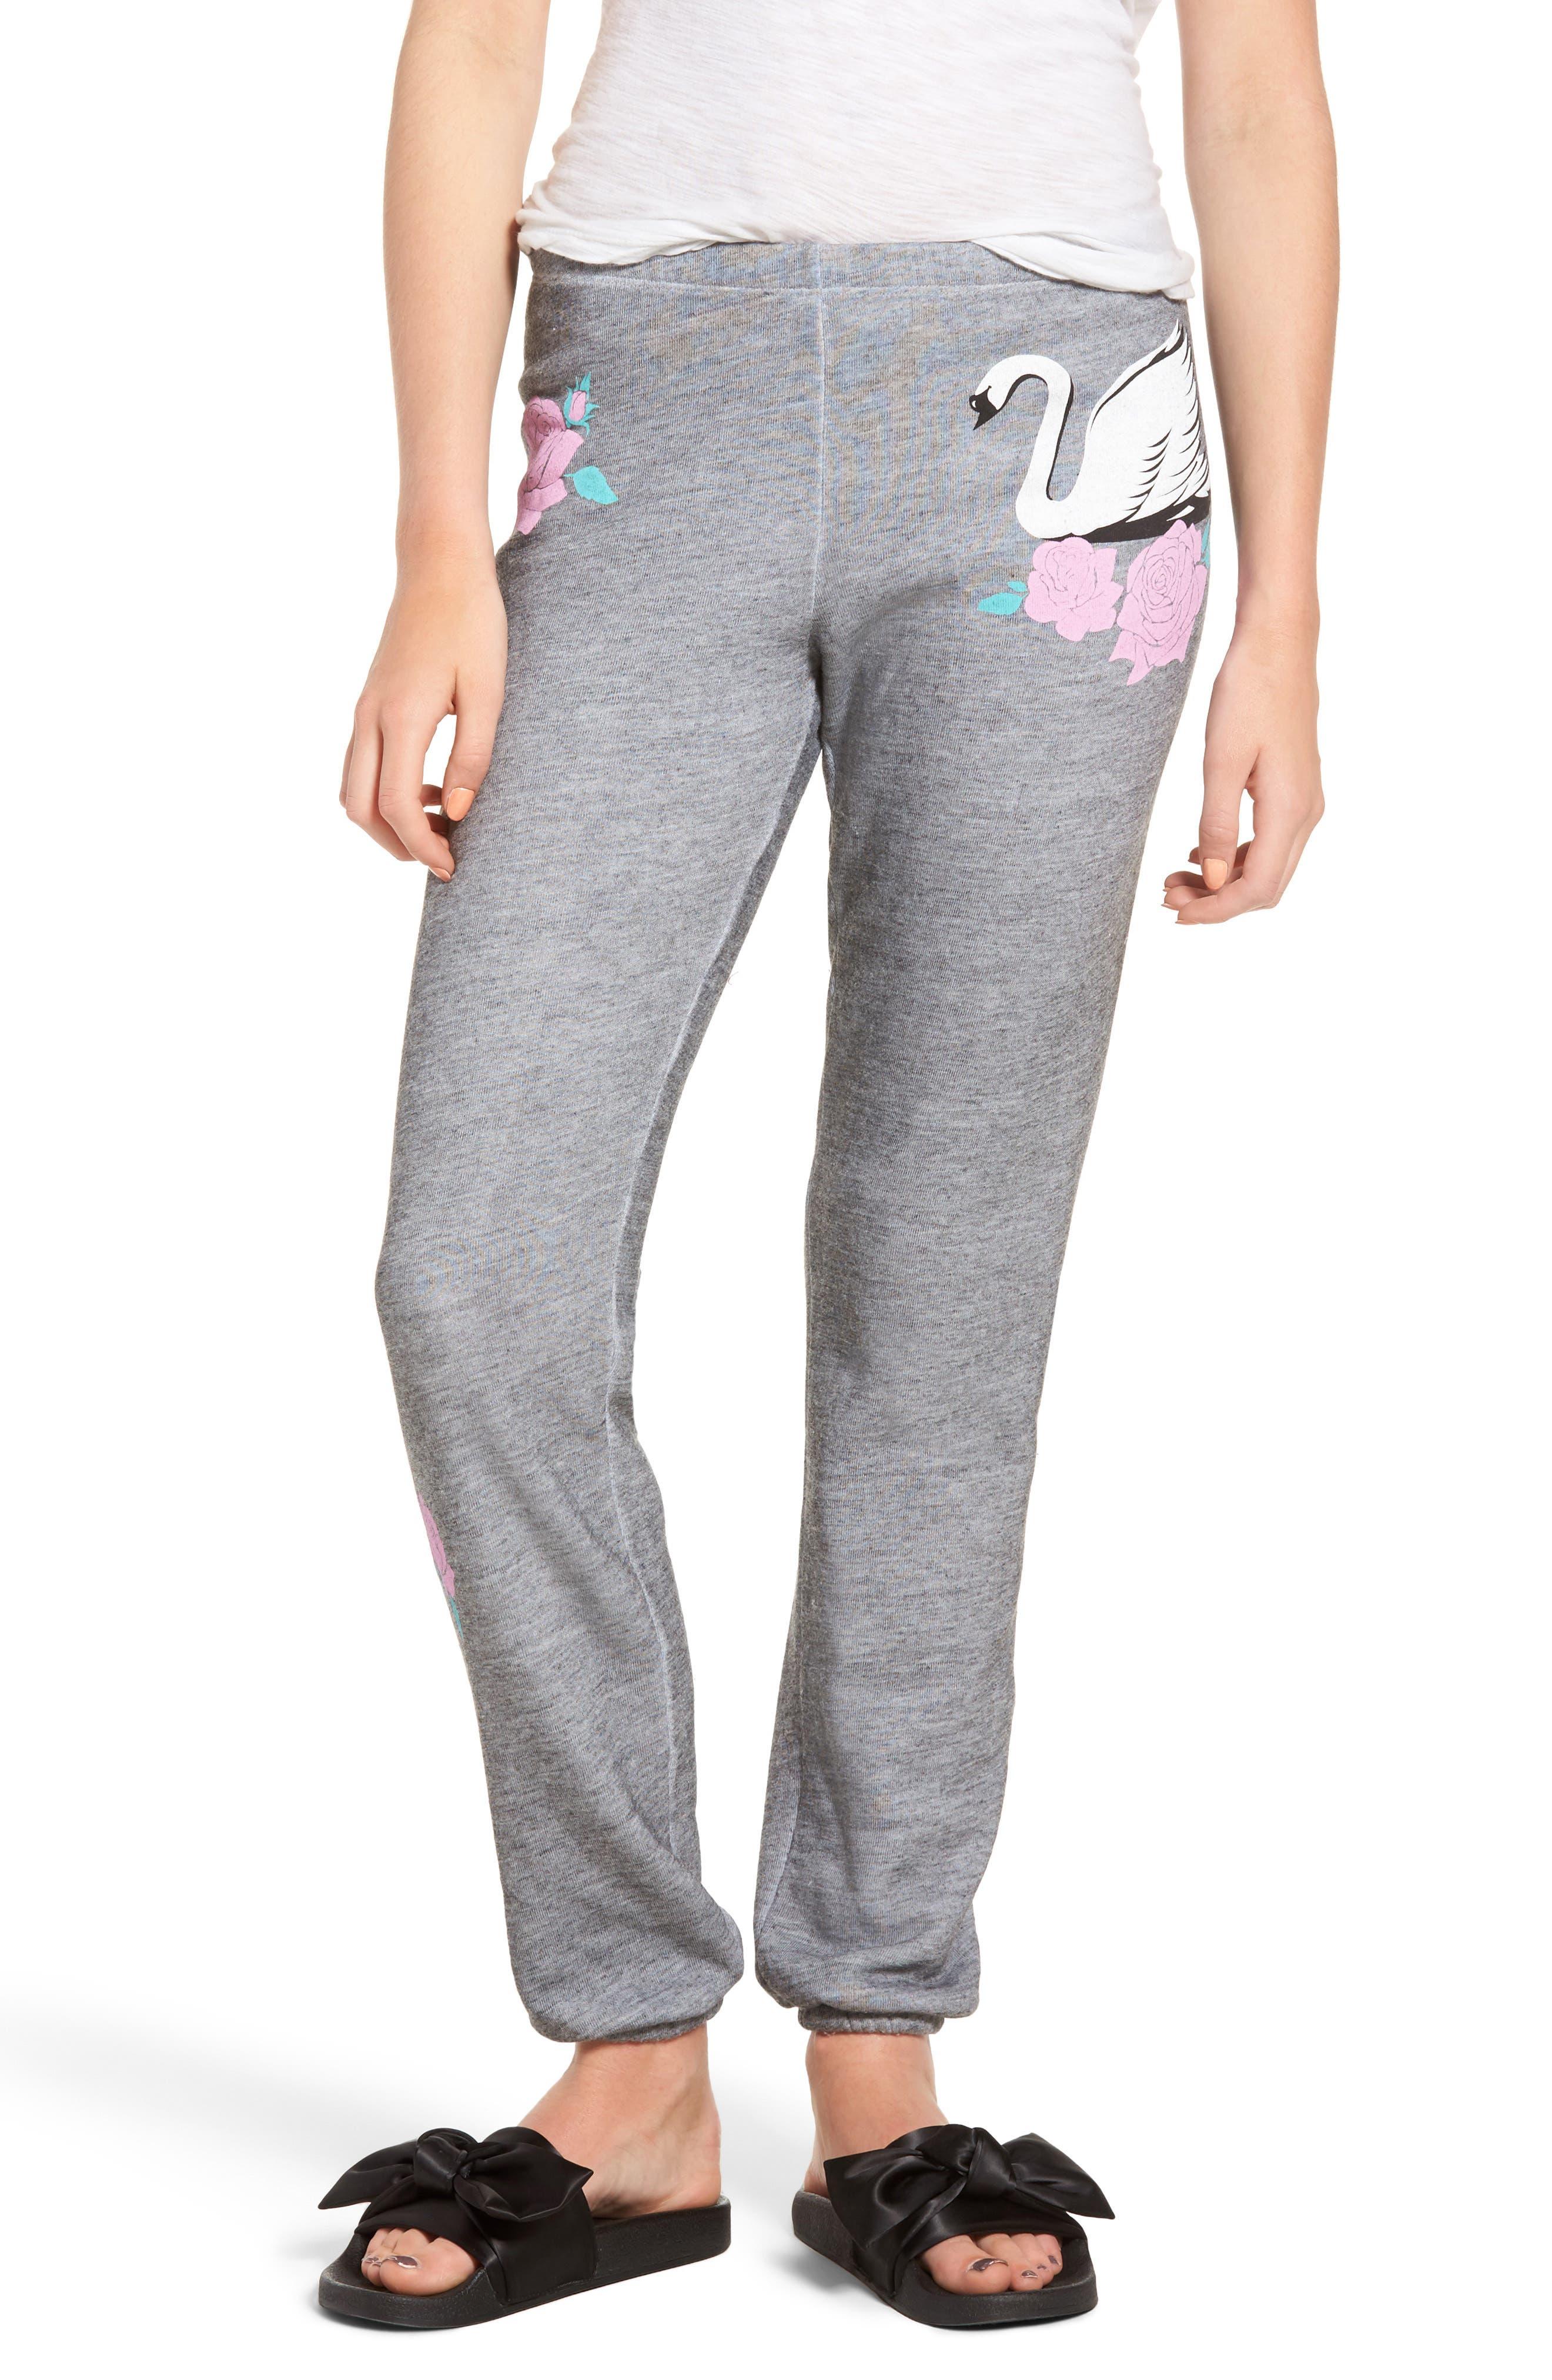 Knox - Swans Crossing Sweatpants,                         Main,                         color,